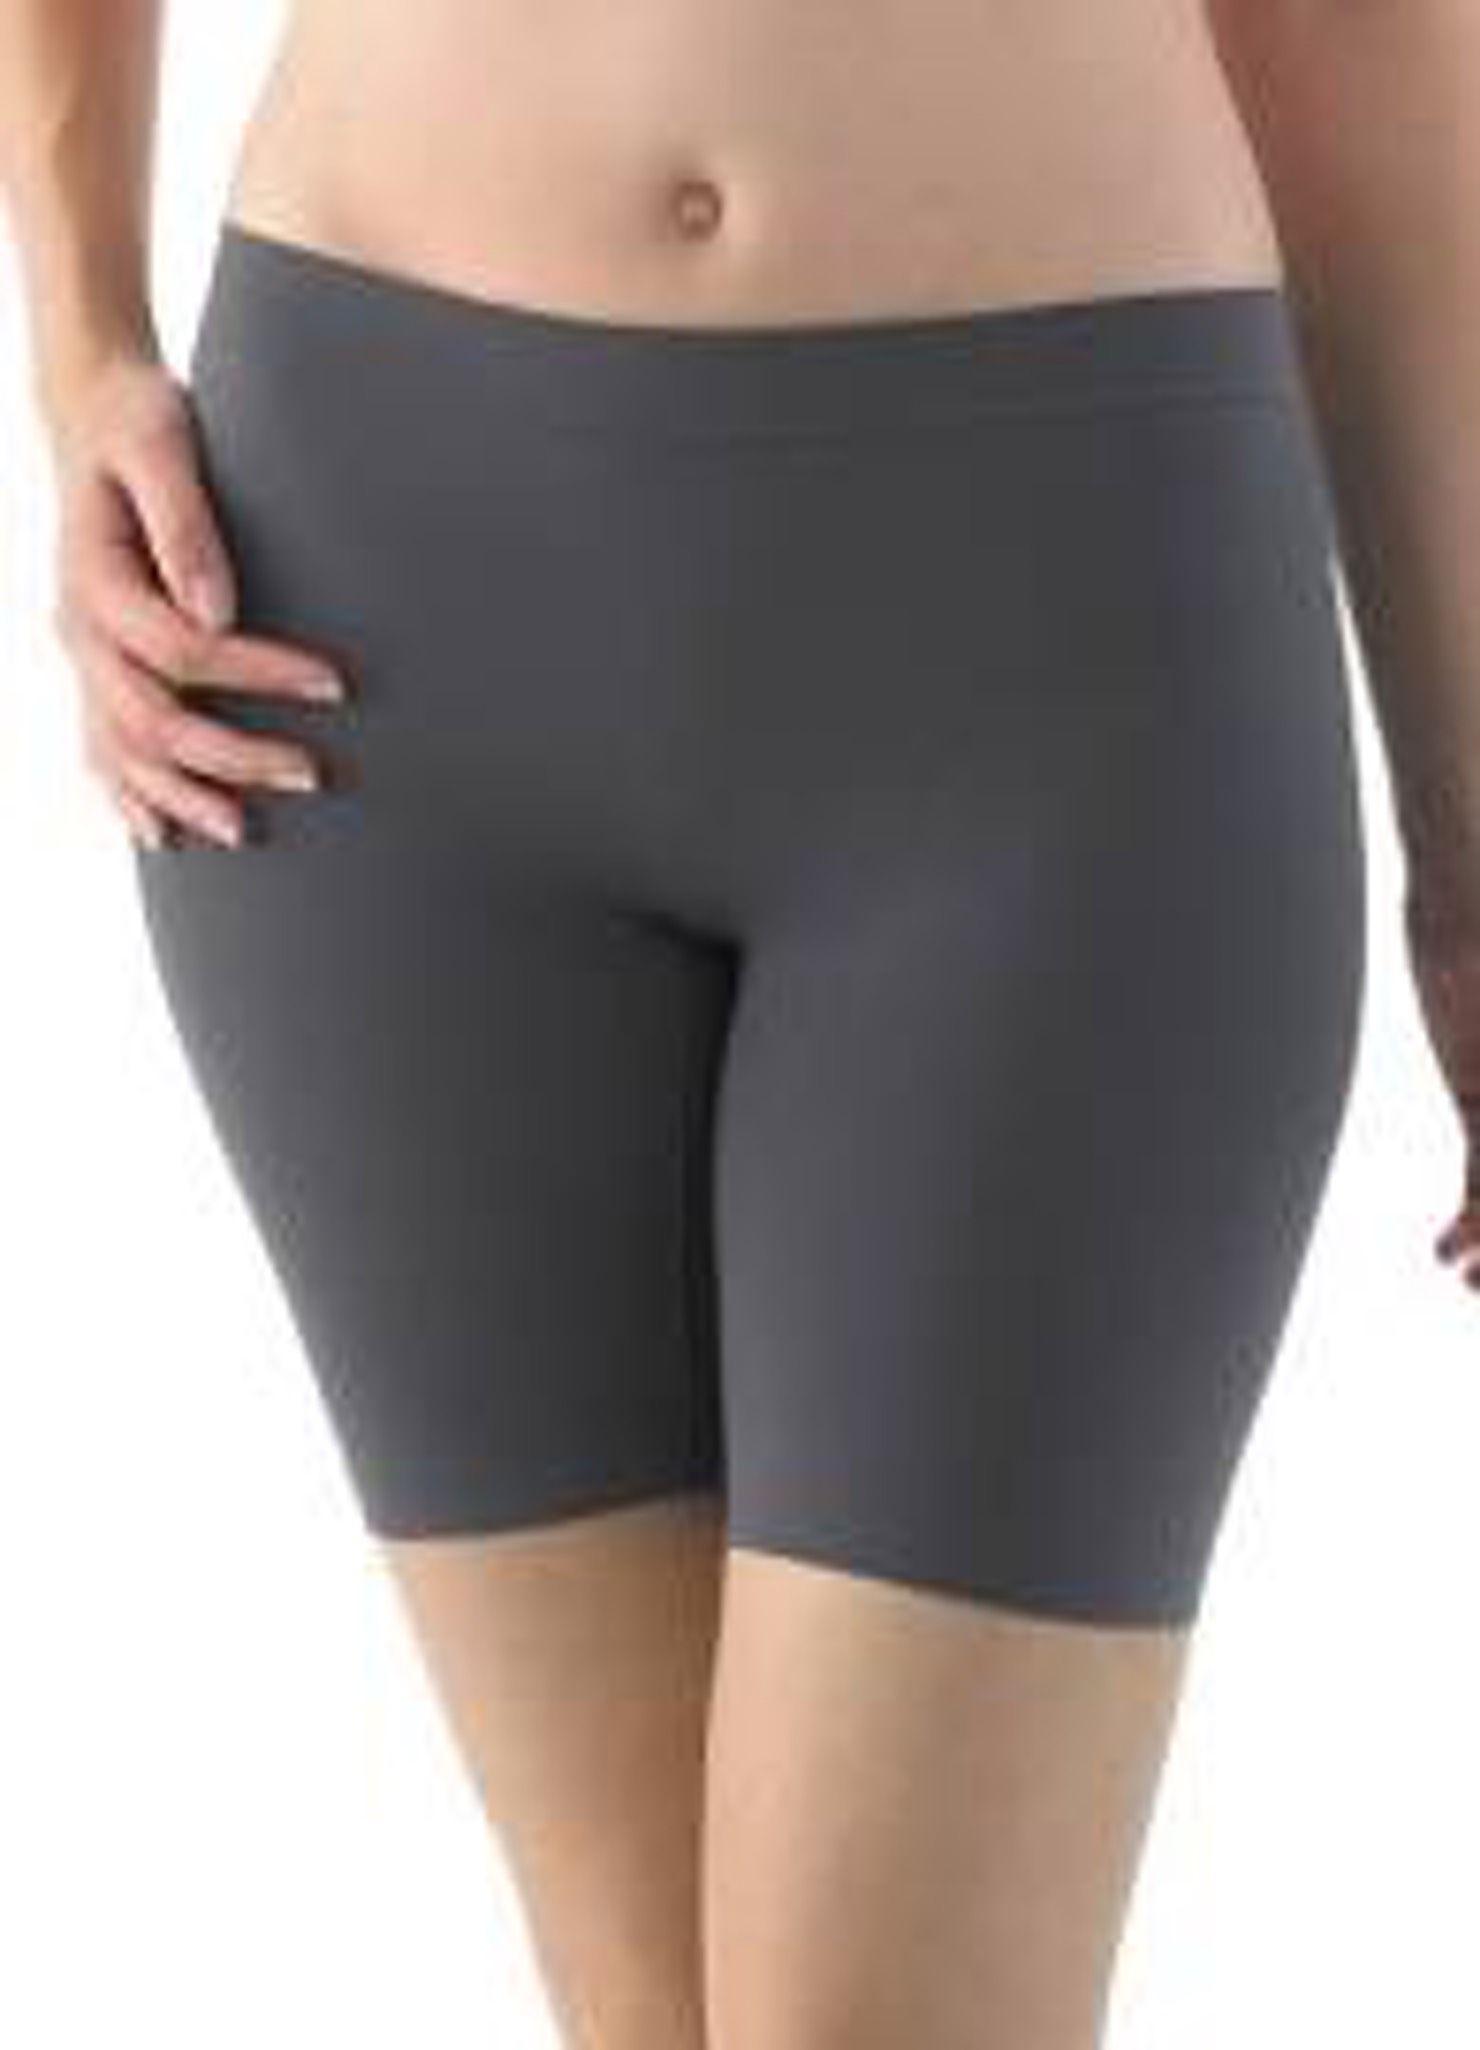 Womens Cotton Shorts Cycling Dance Short Length lot All girls short Underwear